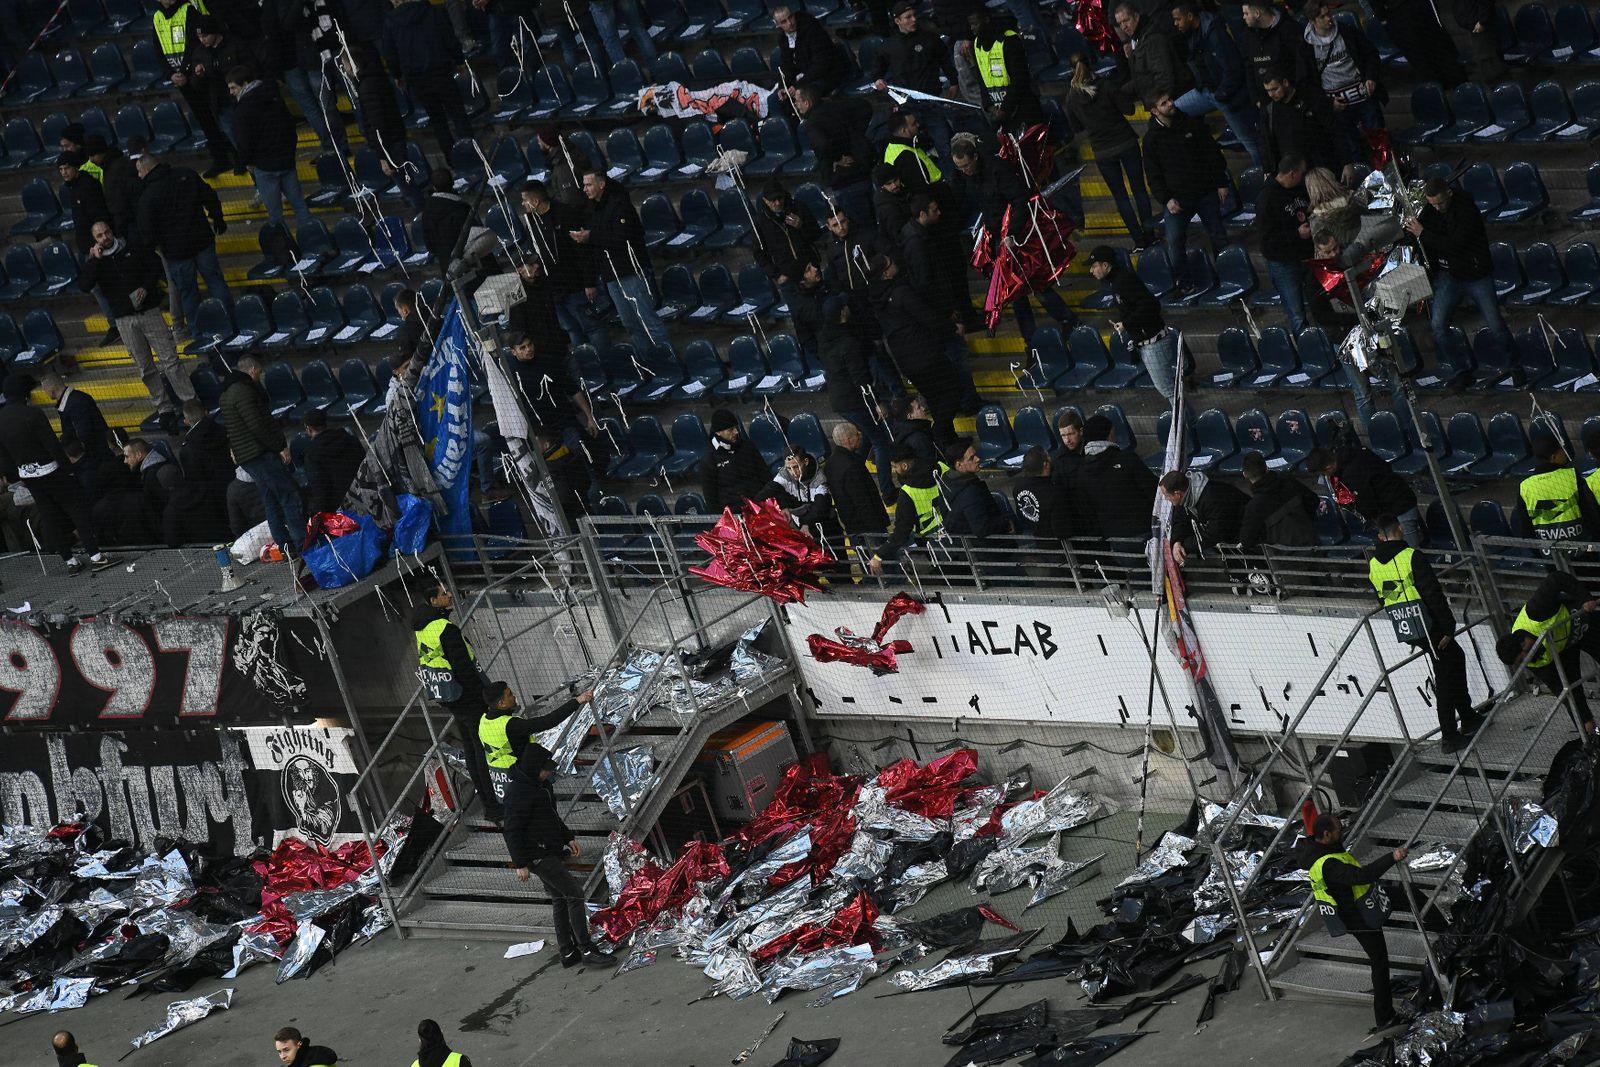 21 02 2019 xmhx Fussball UEFA Europa League Eintracht Frankfurt Schachtar Donezk emspor v l